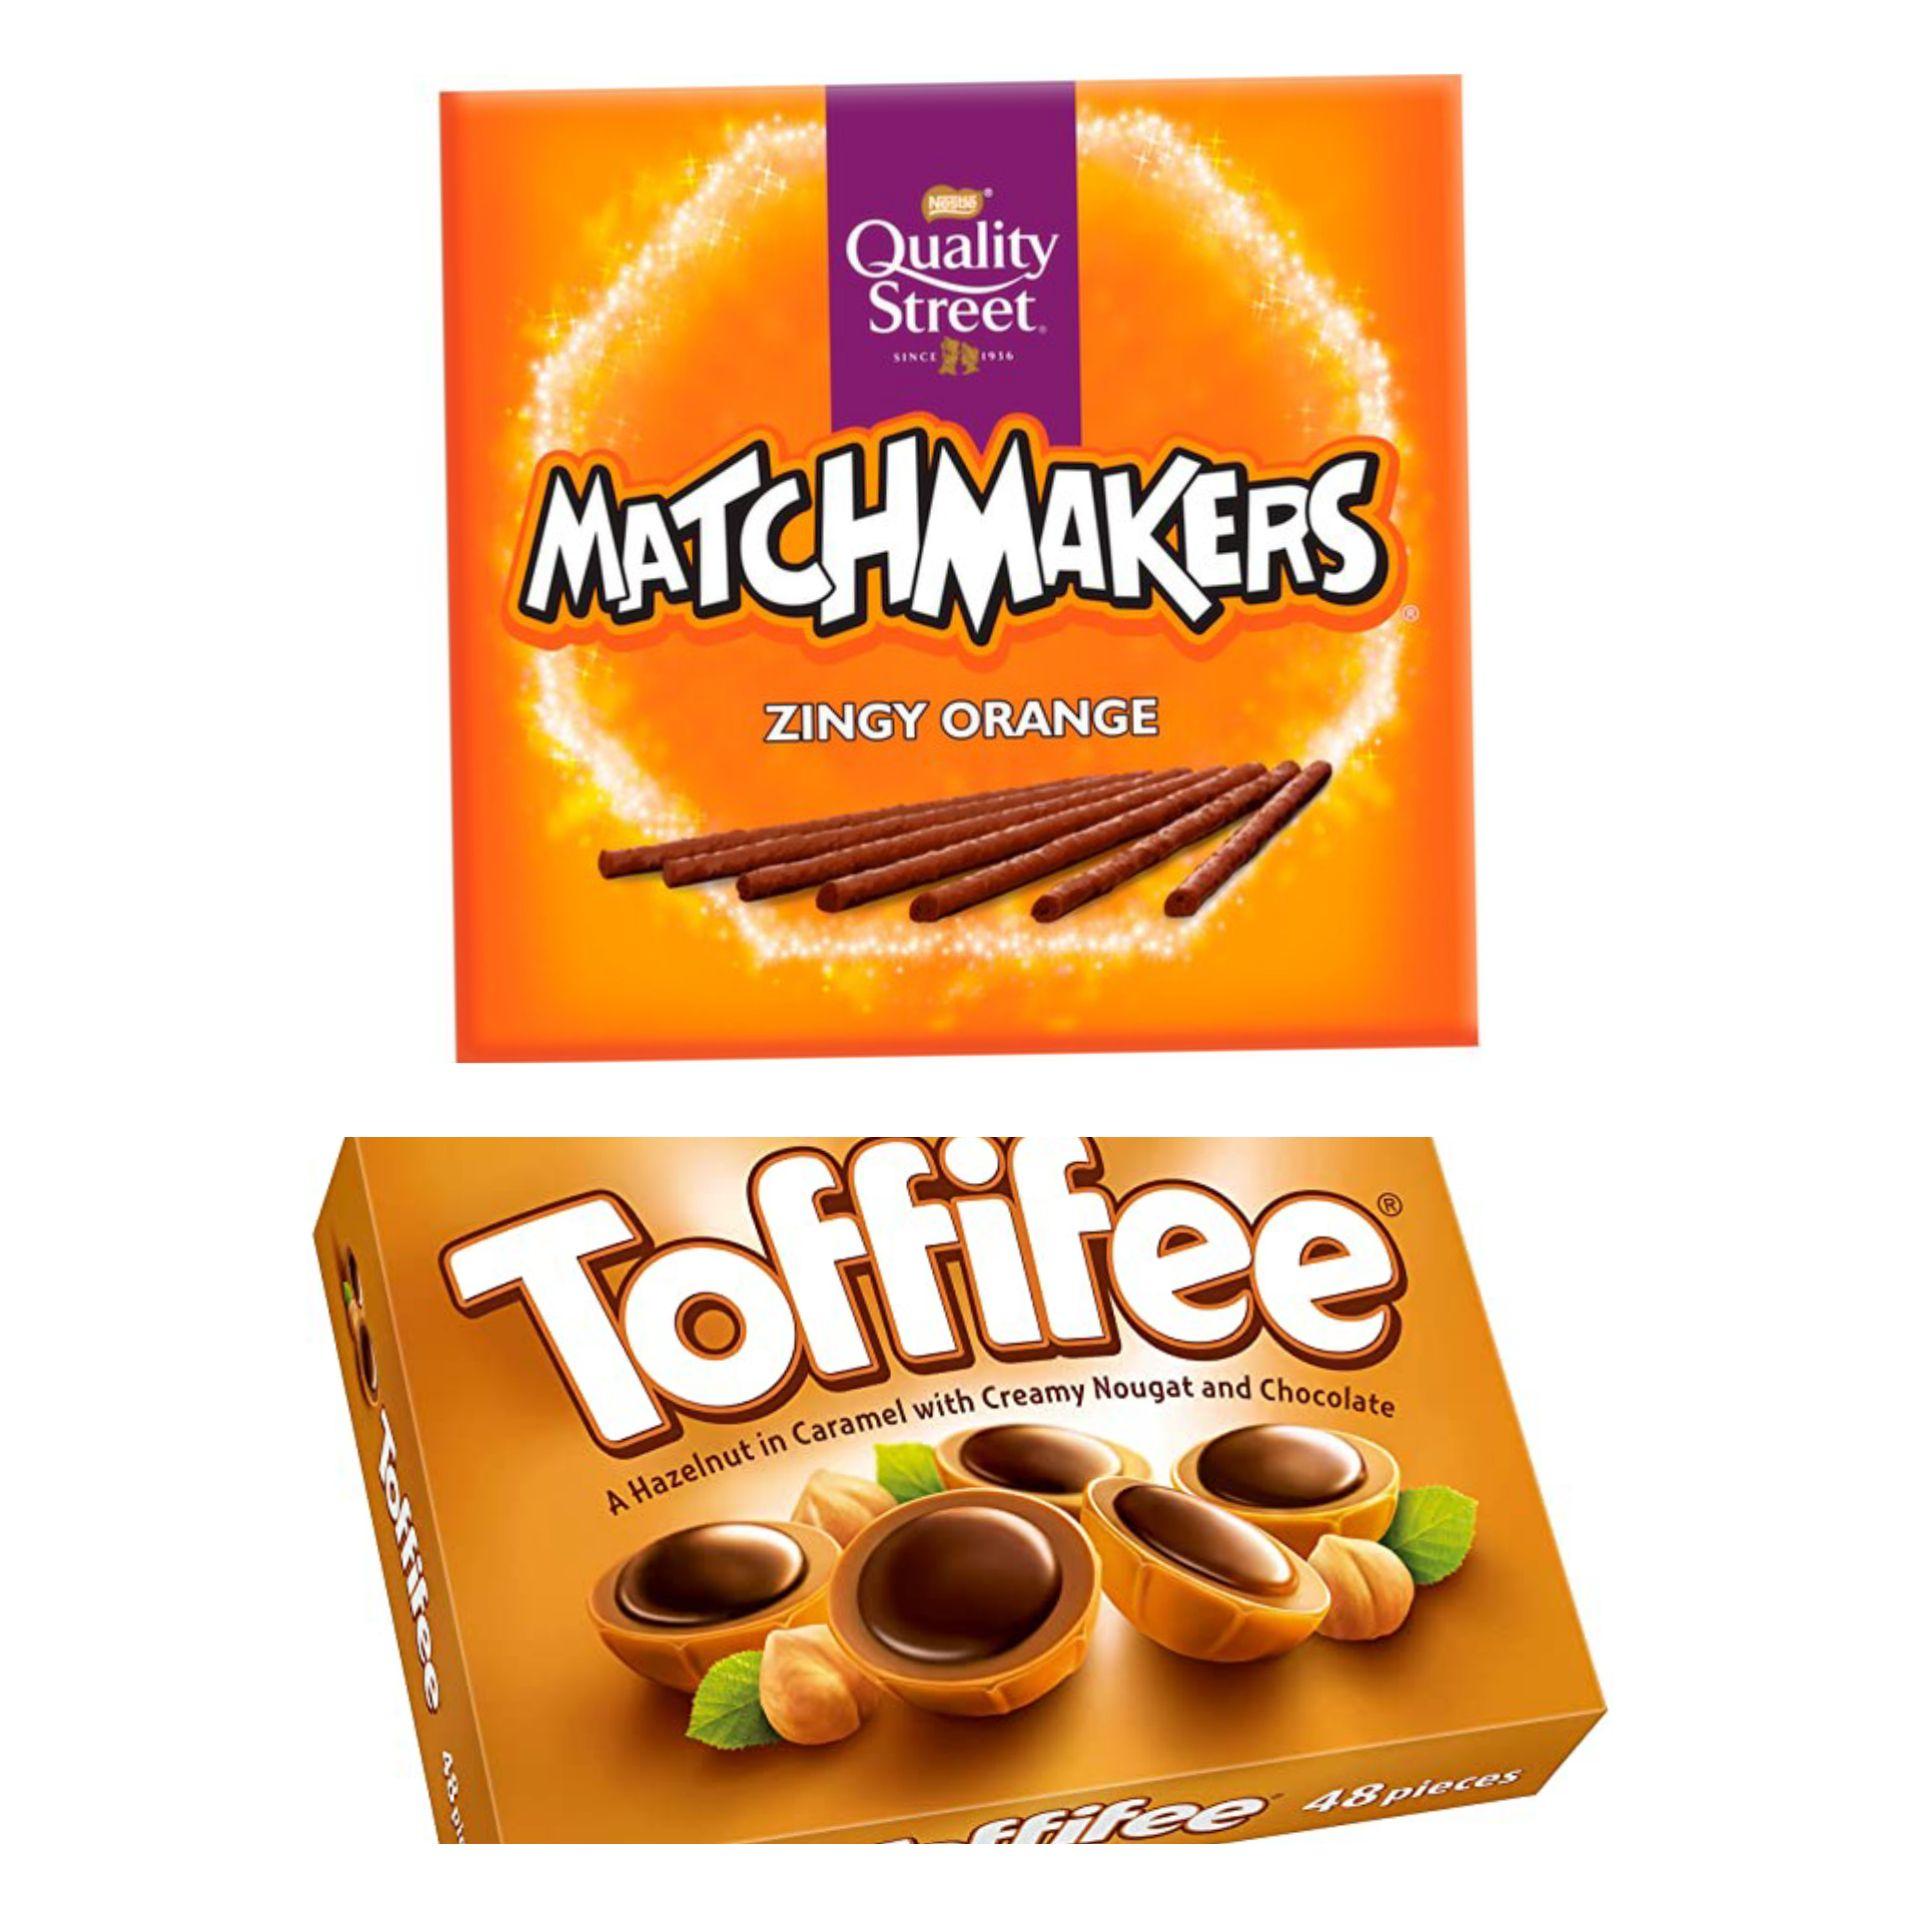 Quality Street Matchmakers Zingy Orange Chocolates 120g/ Toffifee 100g - 98p @ Asda